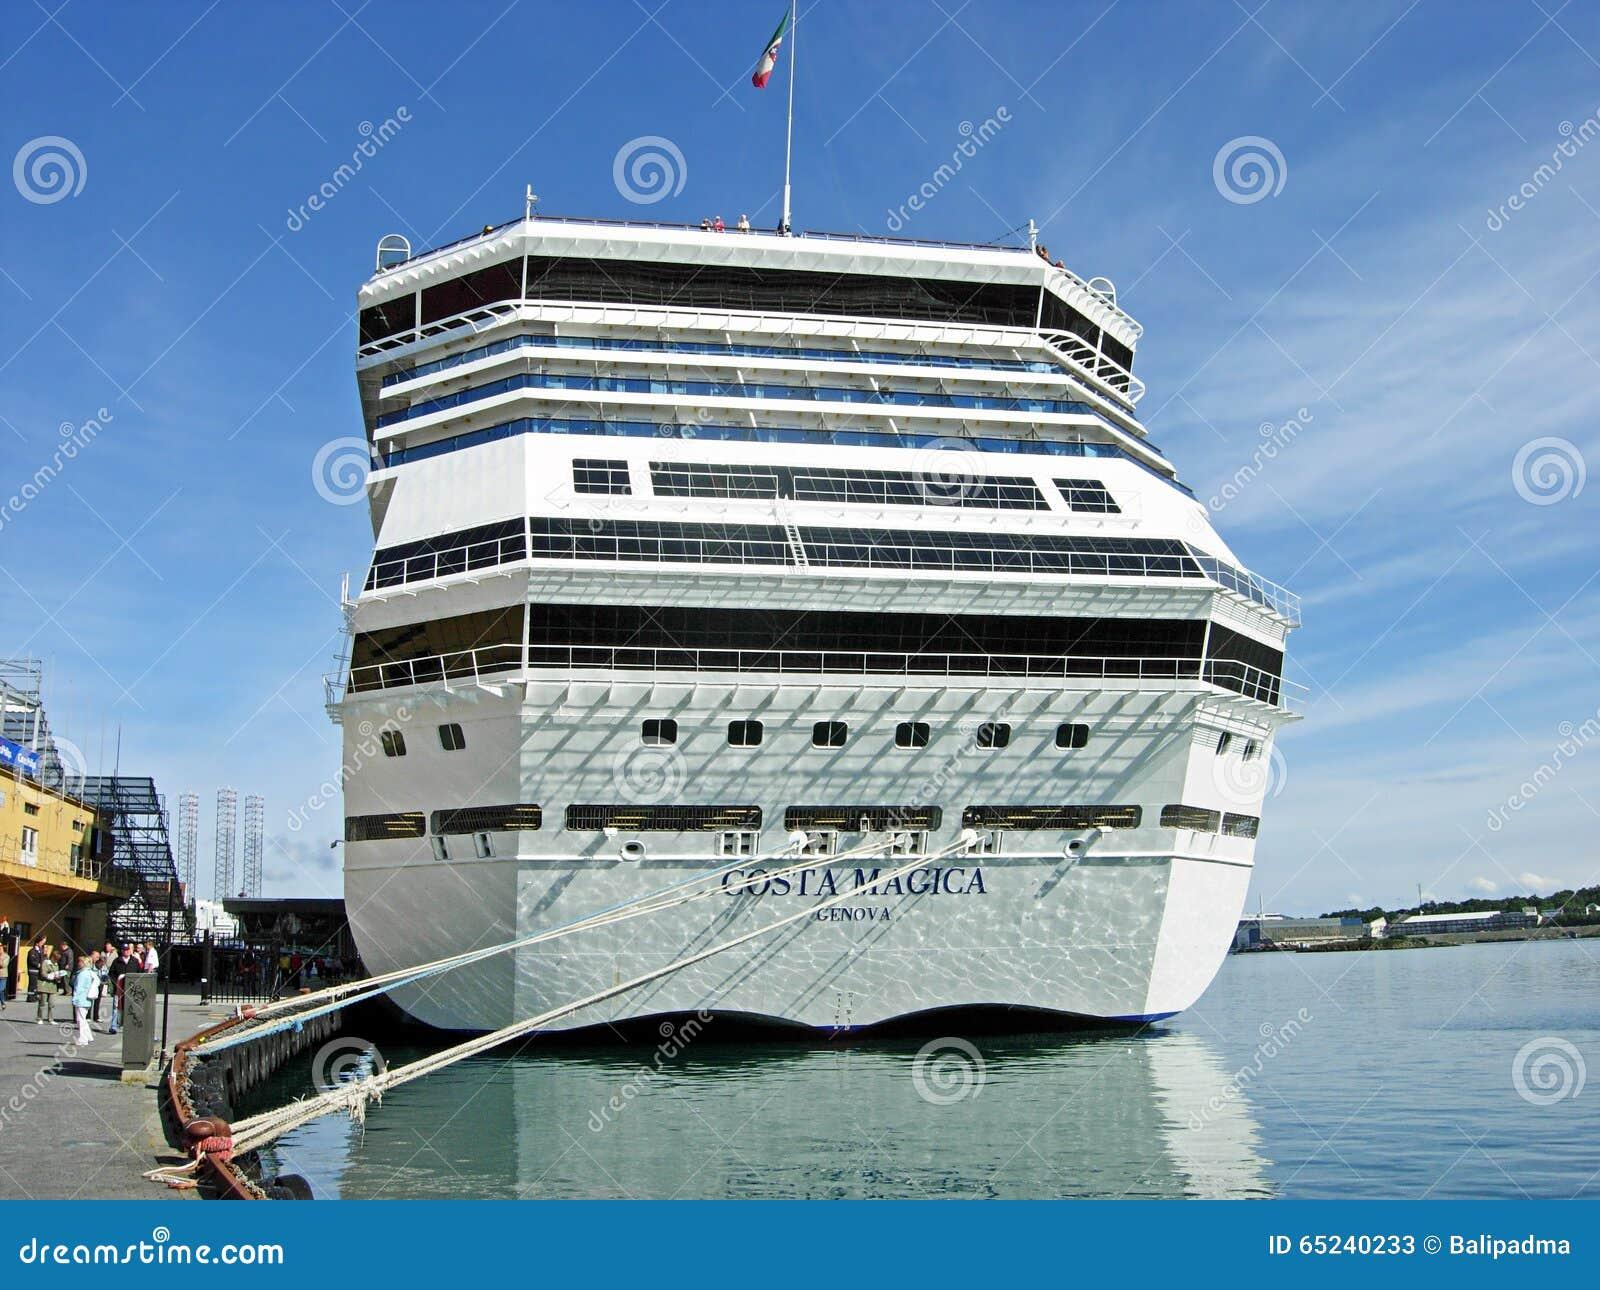 Cruise ship costa magica in stavanger norway editorial for Costa magica immagini